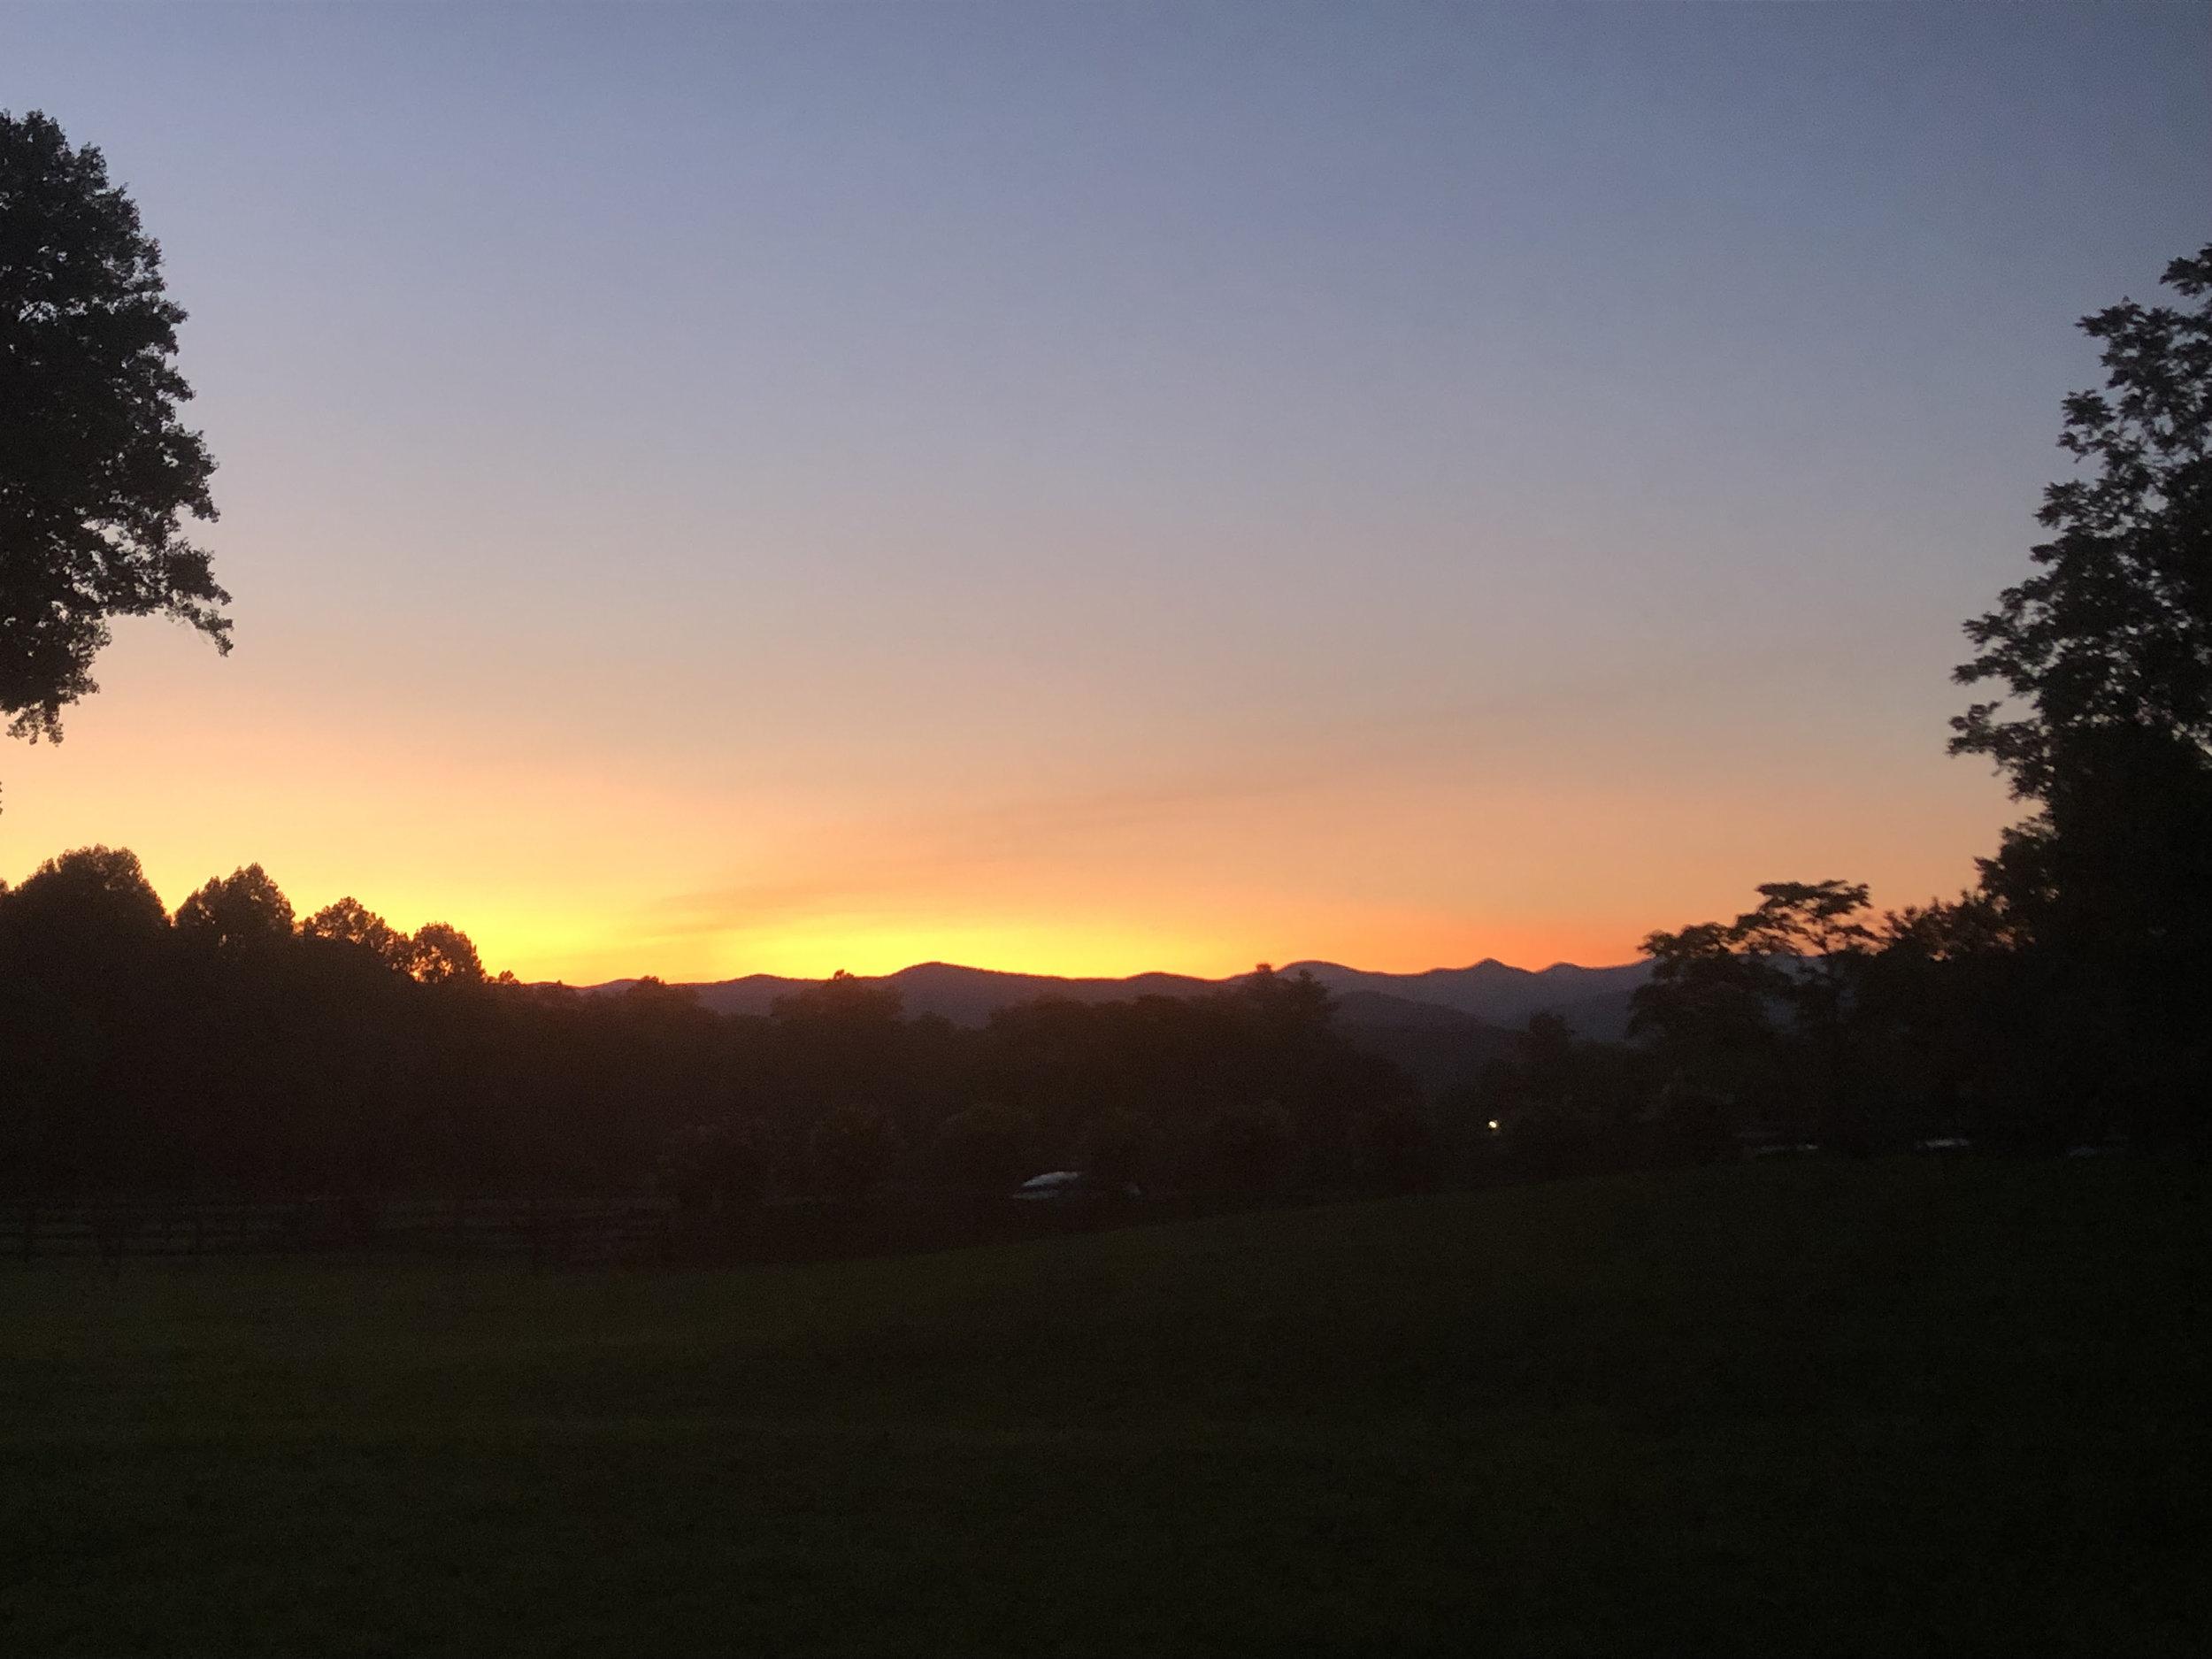 Gwynn Valley at sunset